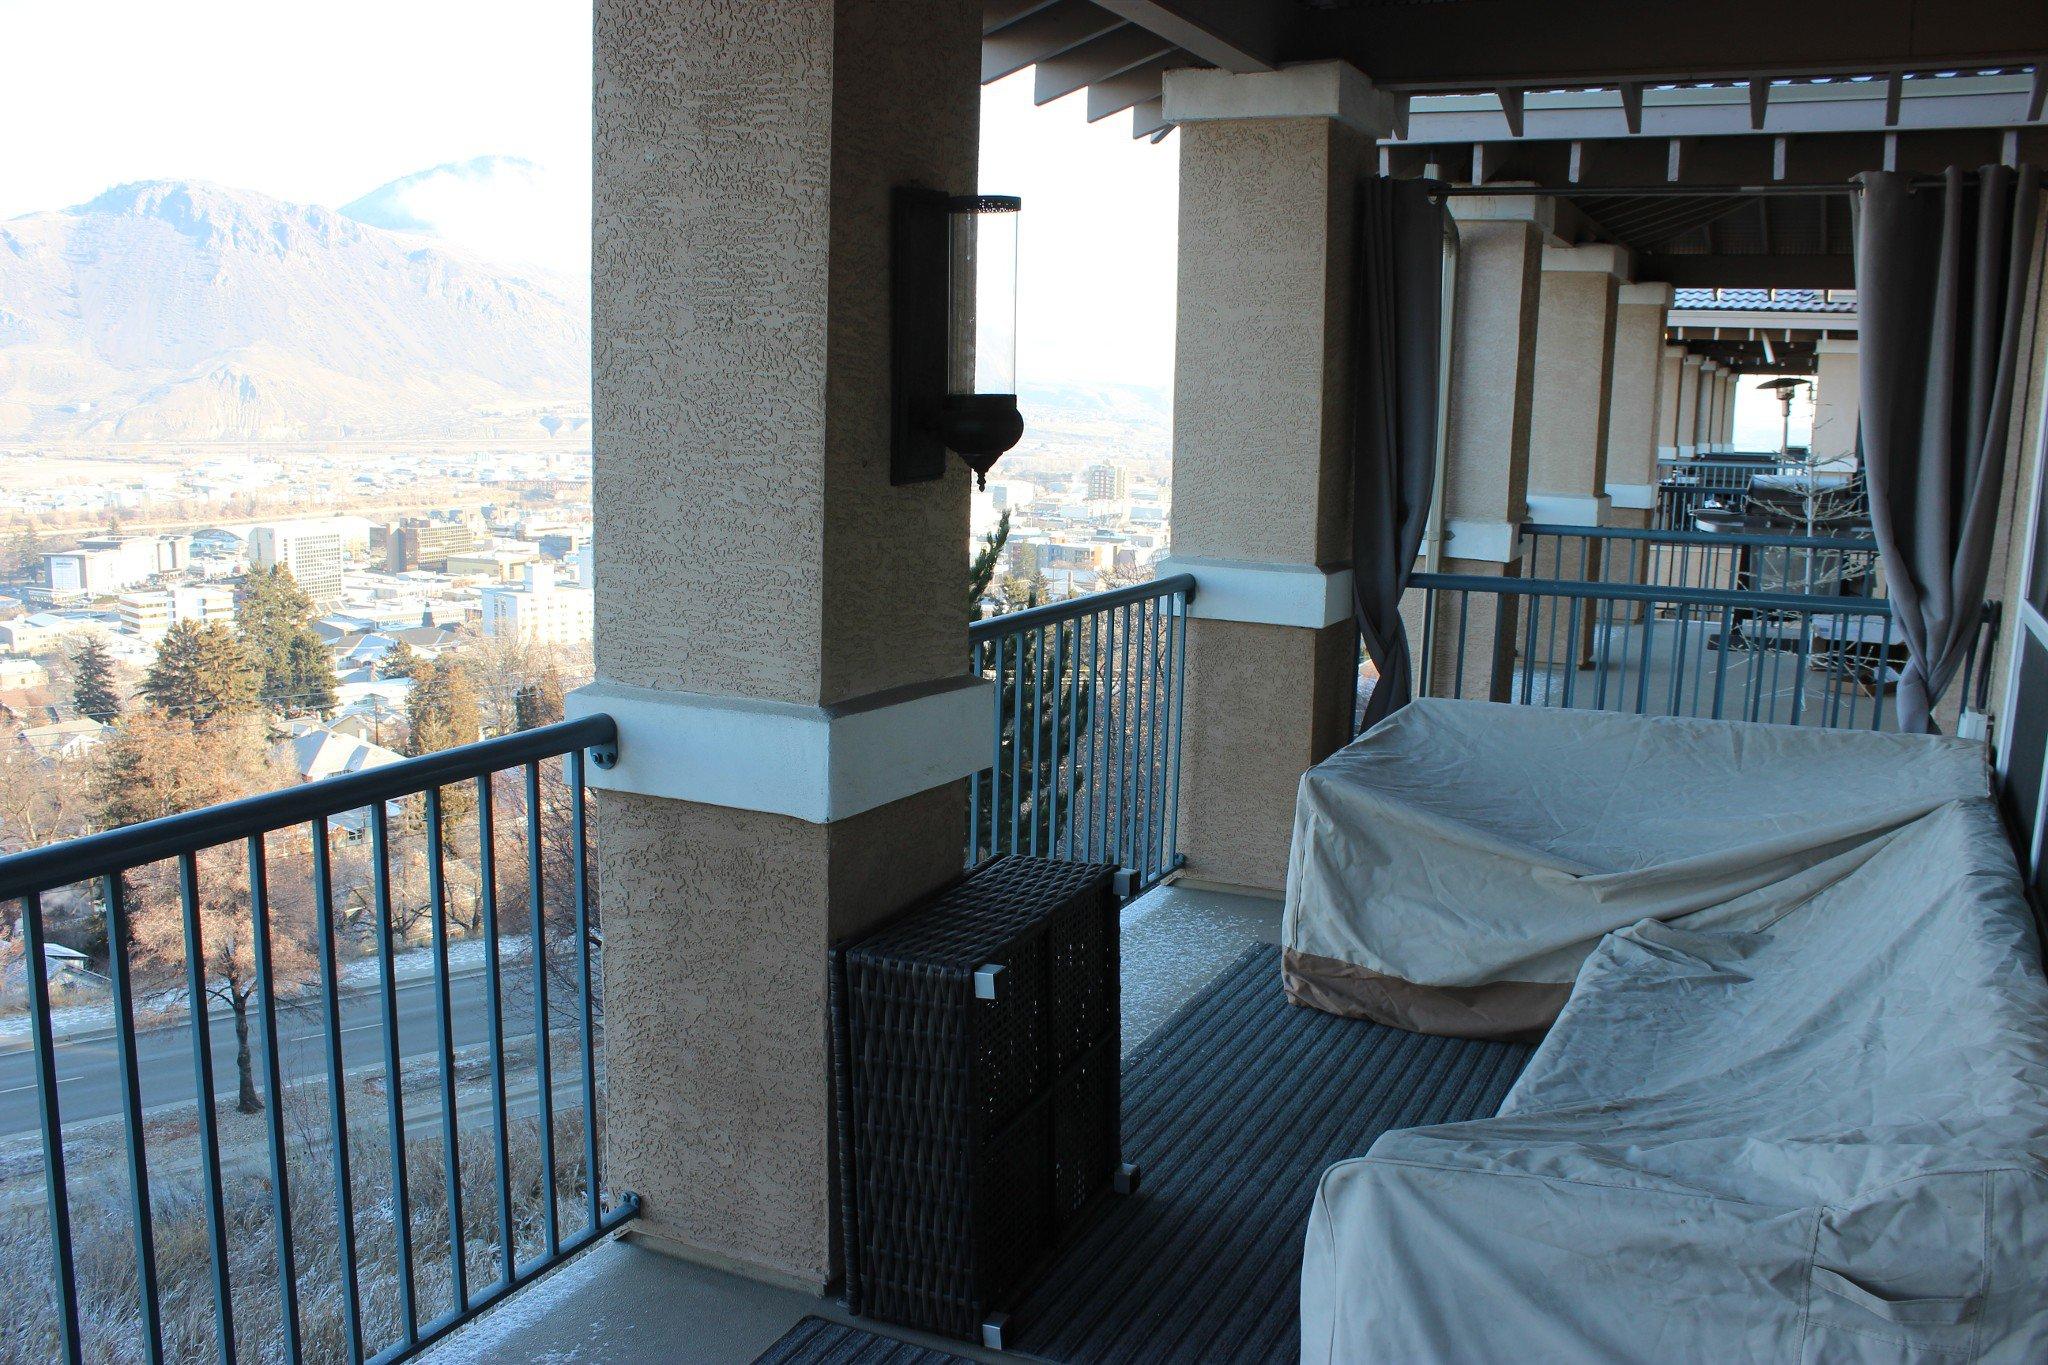 Photo 19: Photos: 101 875 Sahali Terrace in Kamloops: Lower Sahali Townhouse for sale : MLS®# 154556